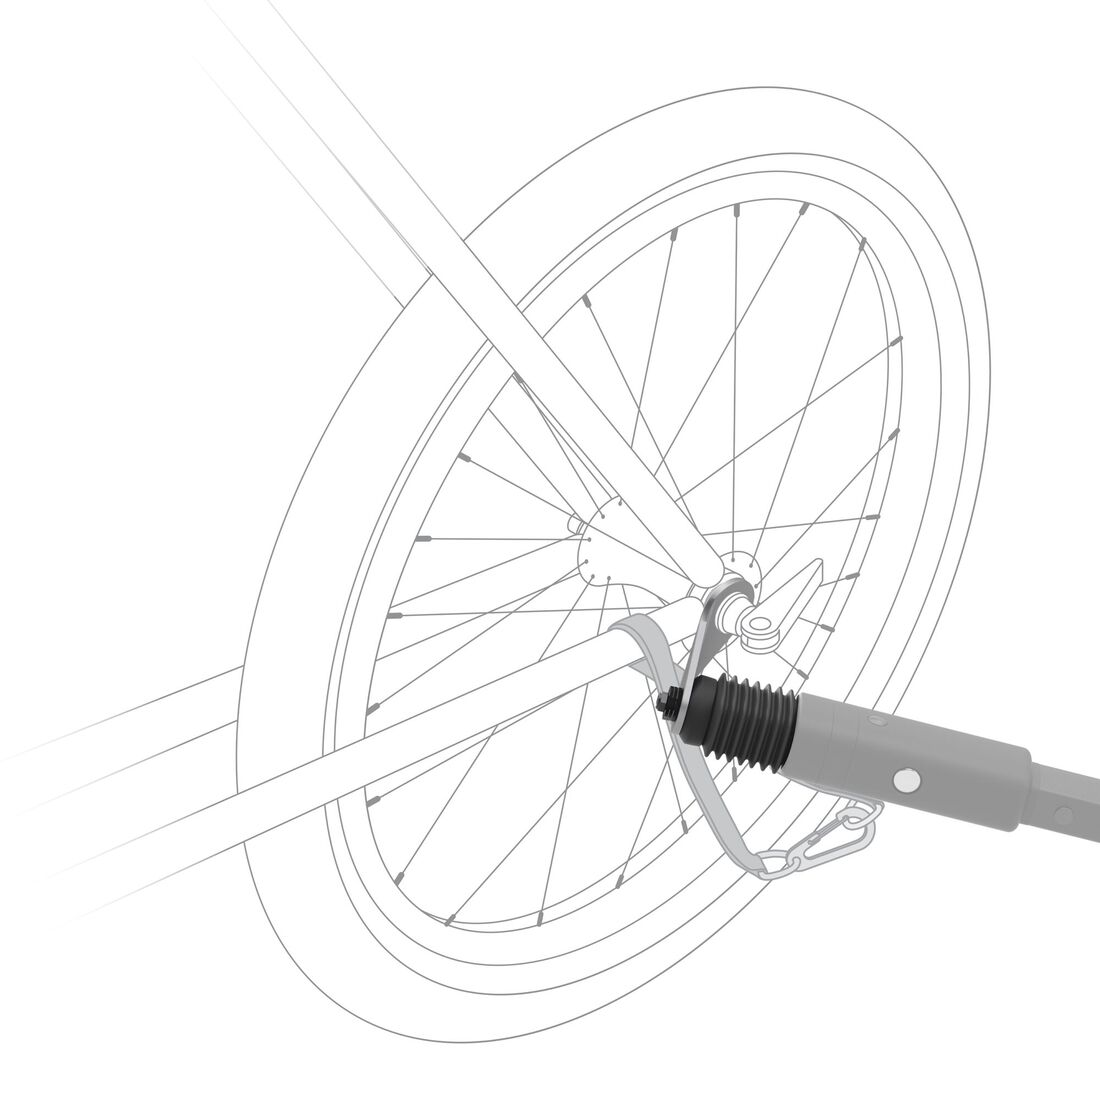 CYBEX Fahrradkupplung - Black in Black large Bild 2